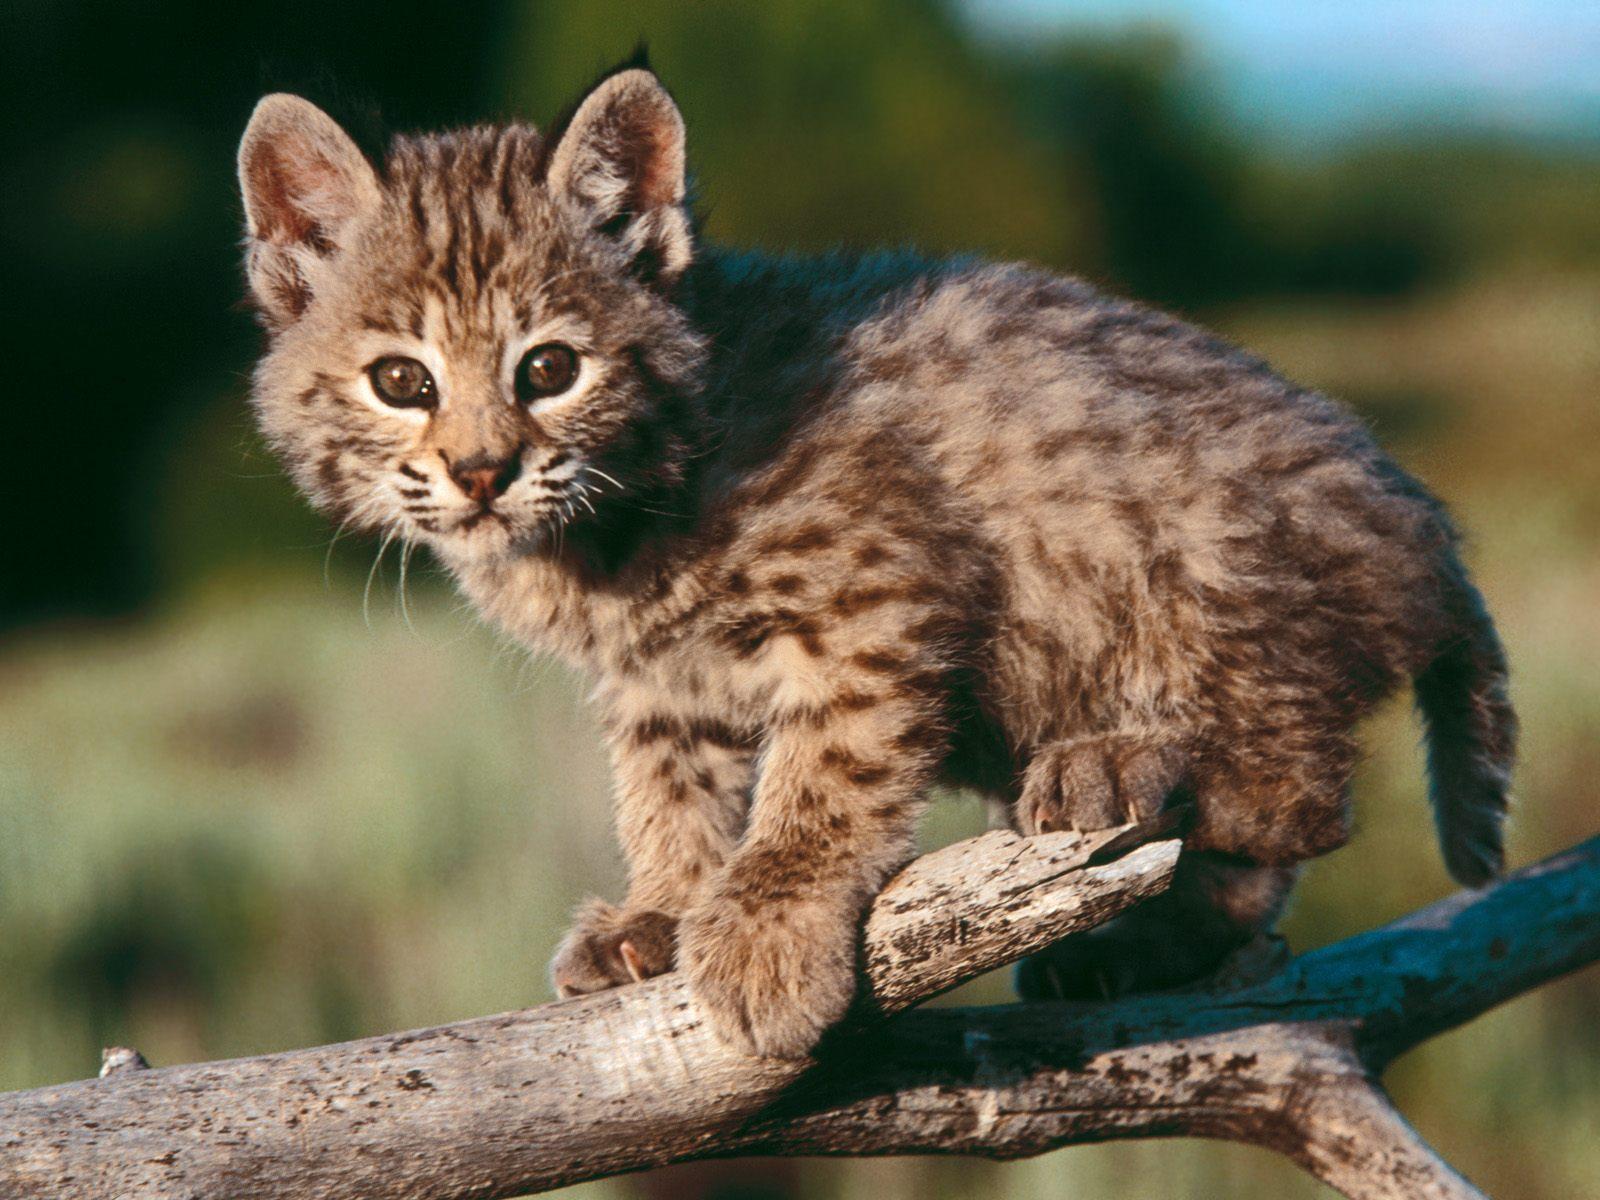 http://2.bp.blogspot.com/-jJ5ak97lTi0/TqxmgX9OYRI/AAAAAAAAAIk/S9wBA4VEAcw/s1600/Baby+Bobcat.jpg